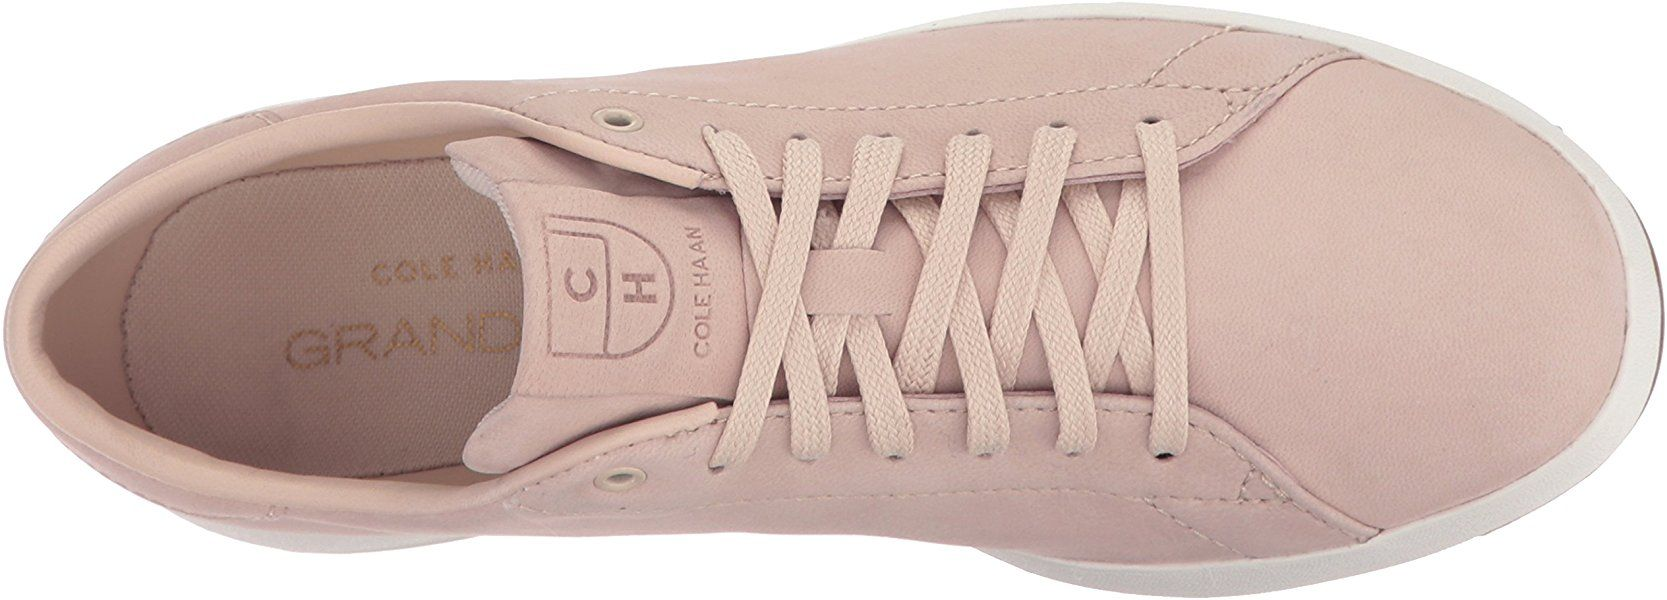 Cole haan women shoes